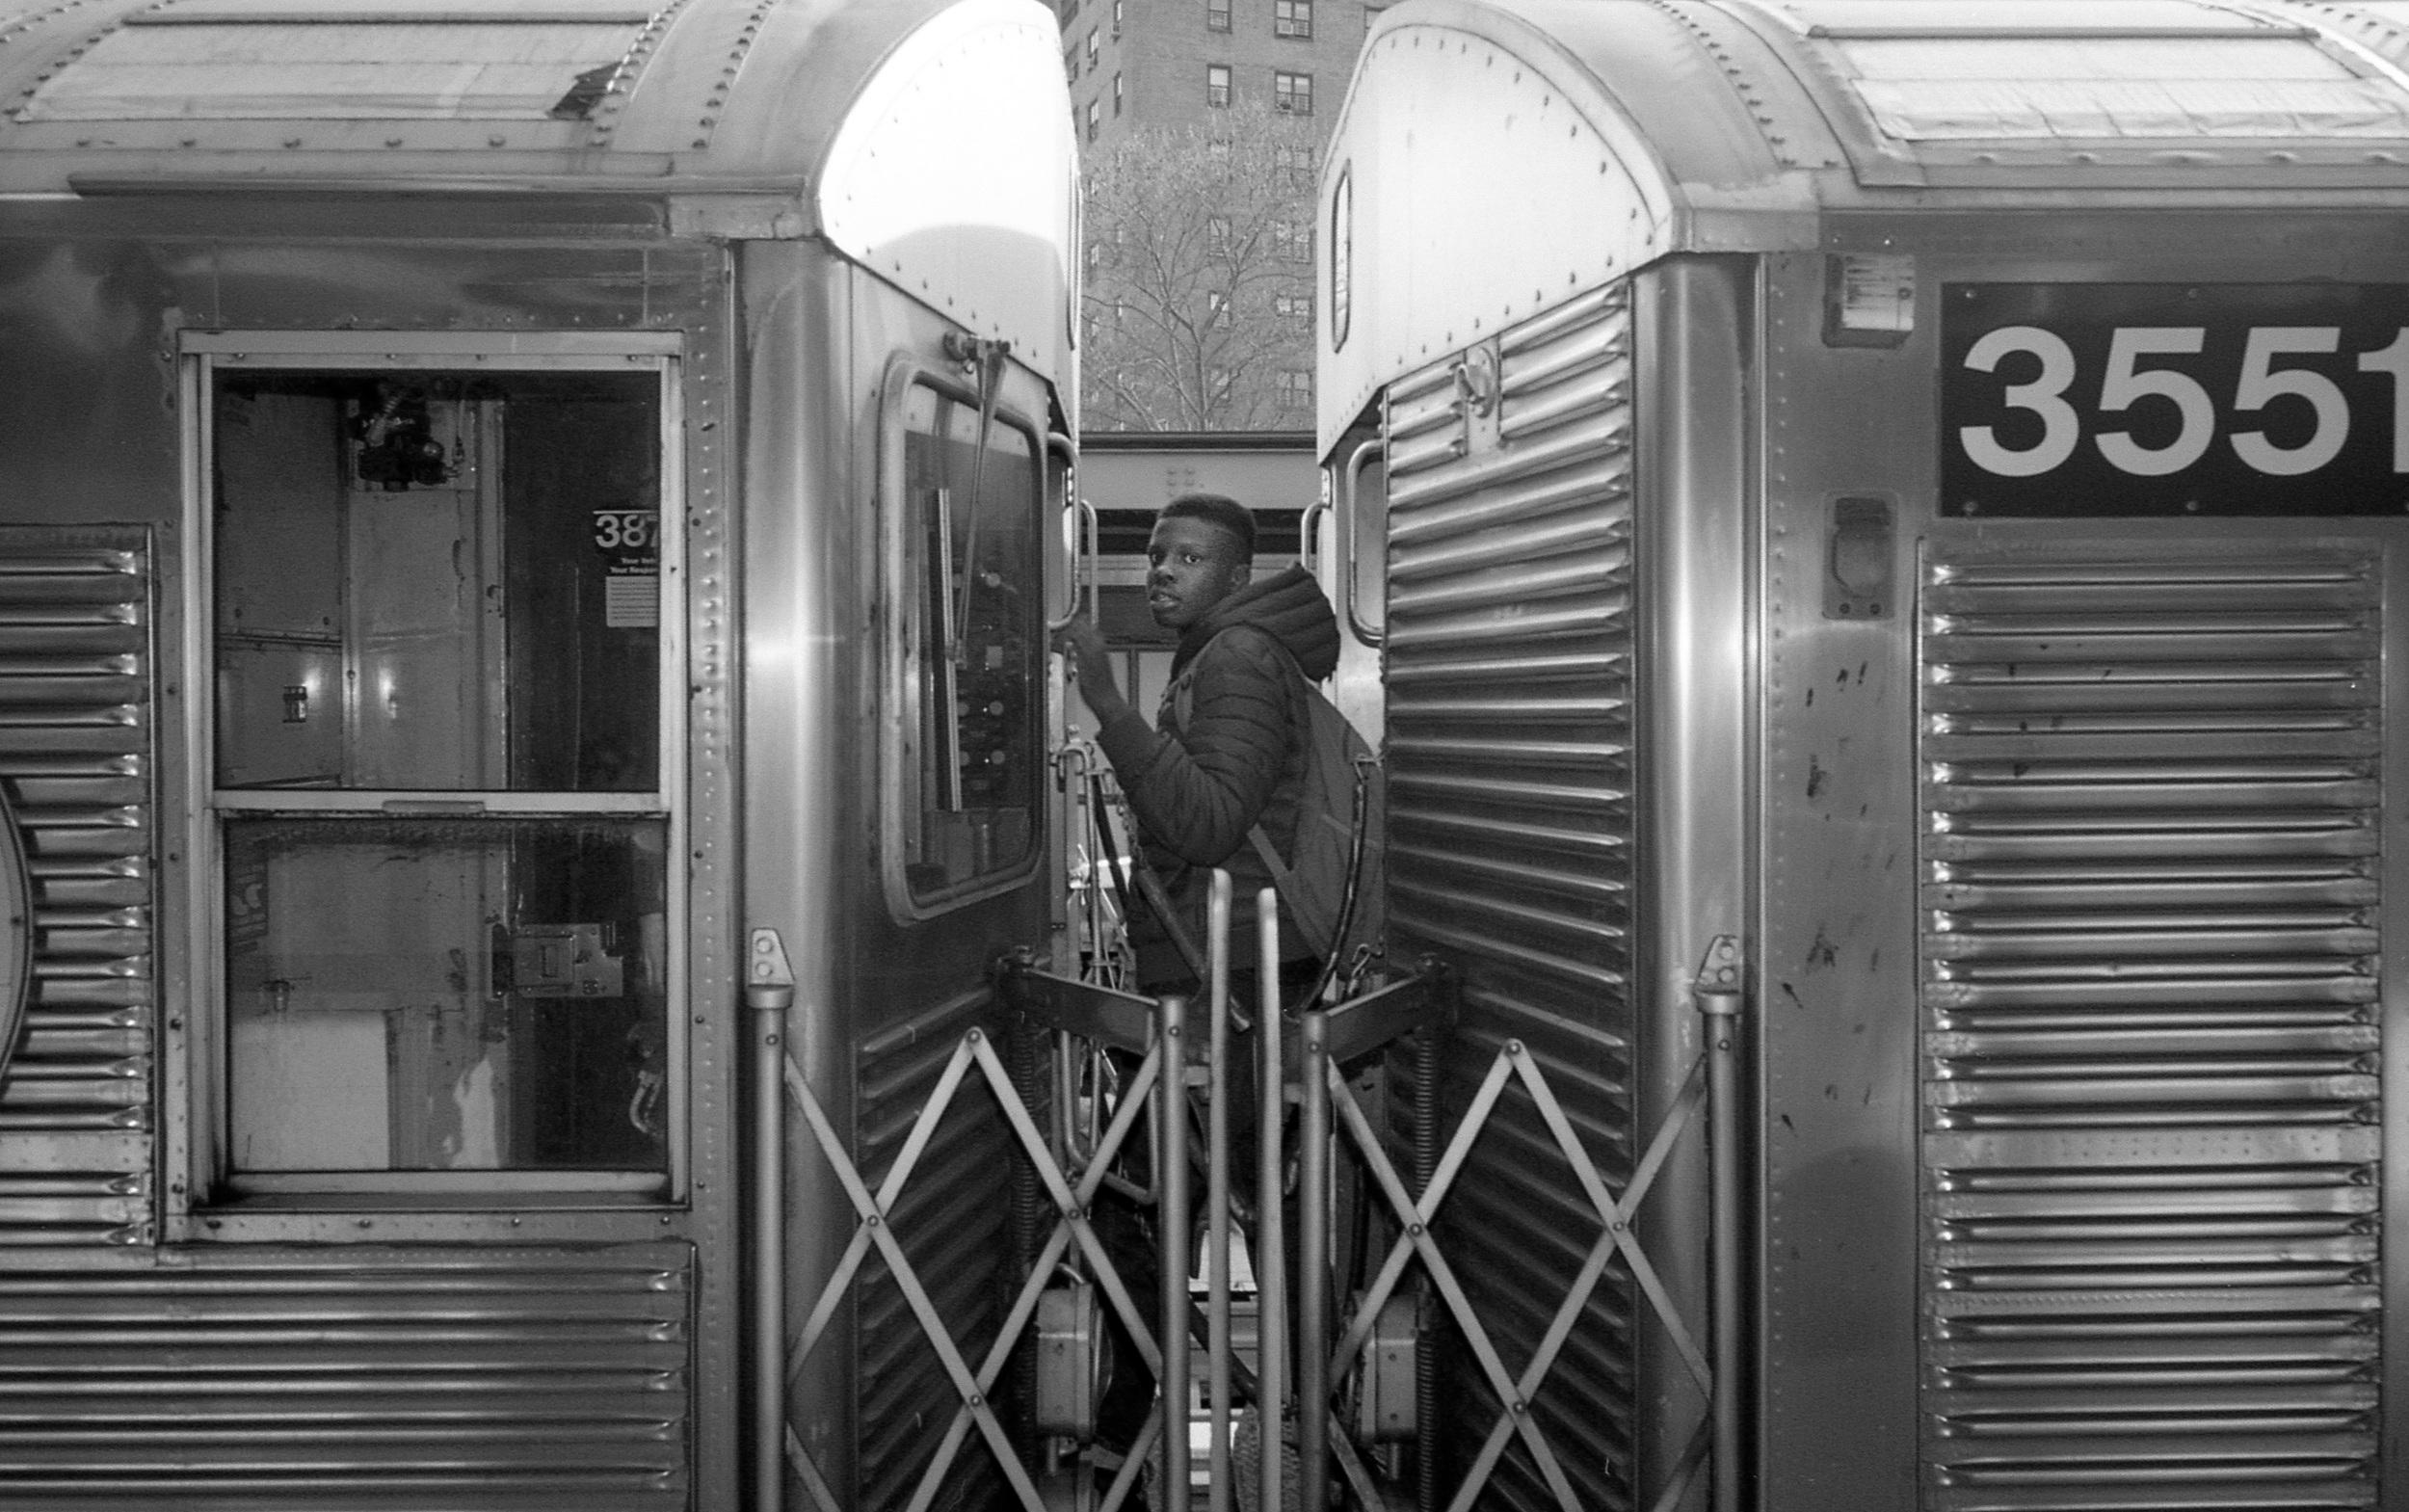 black kid changes trains.jpg